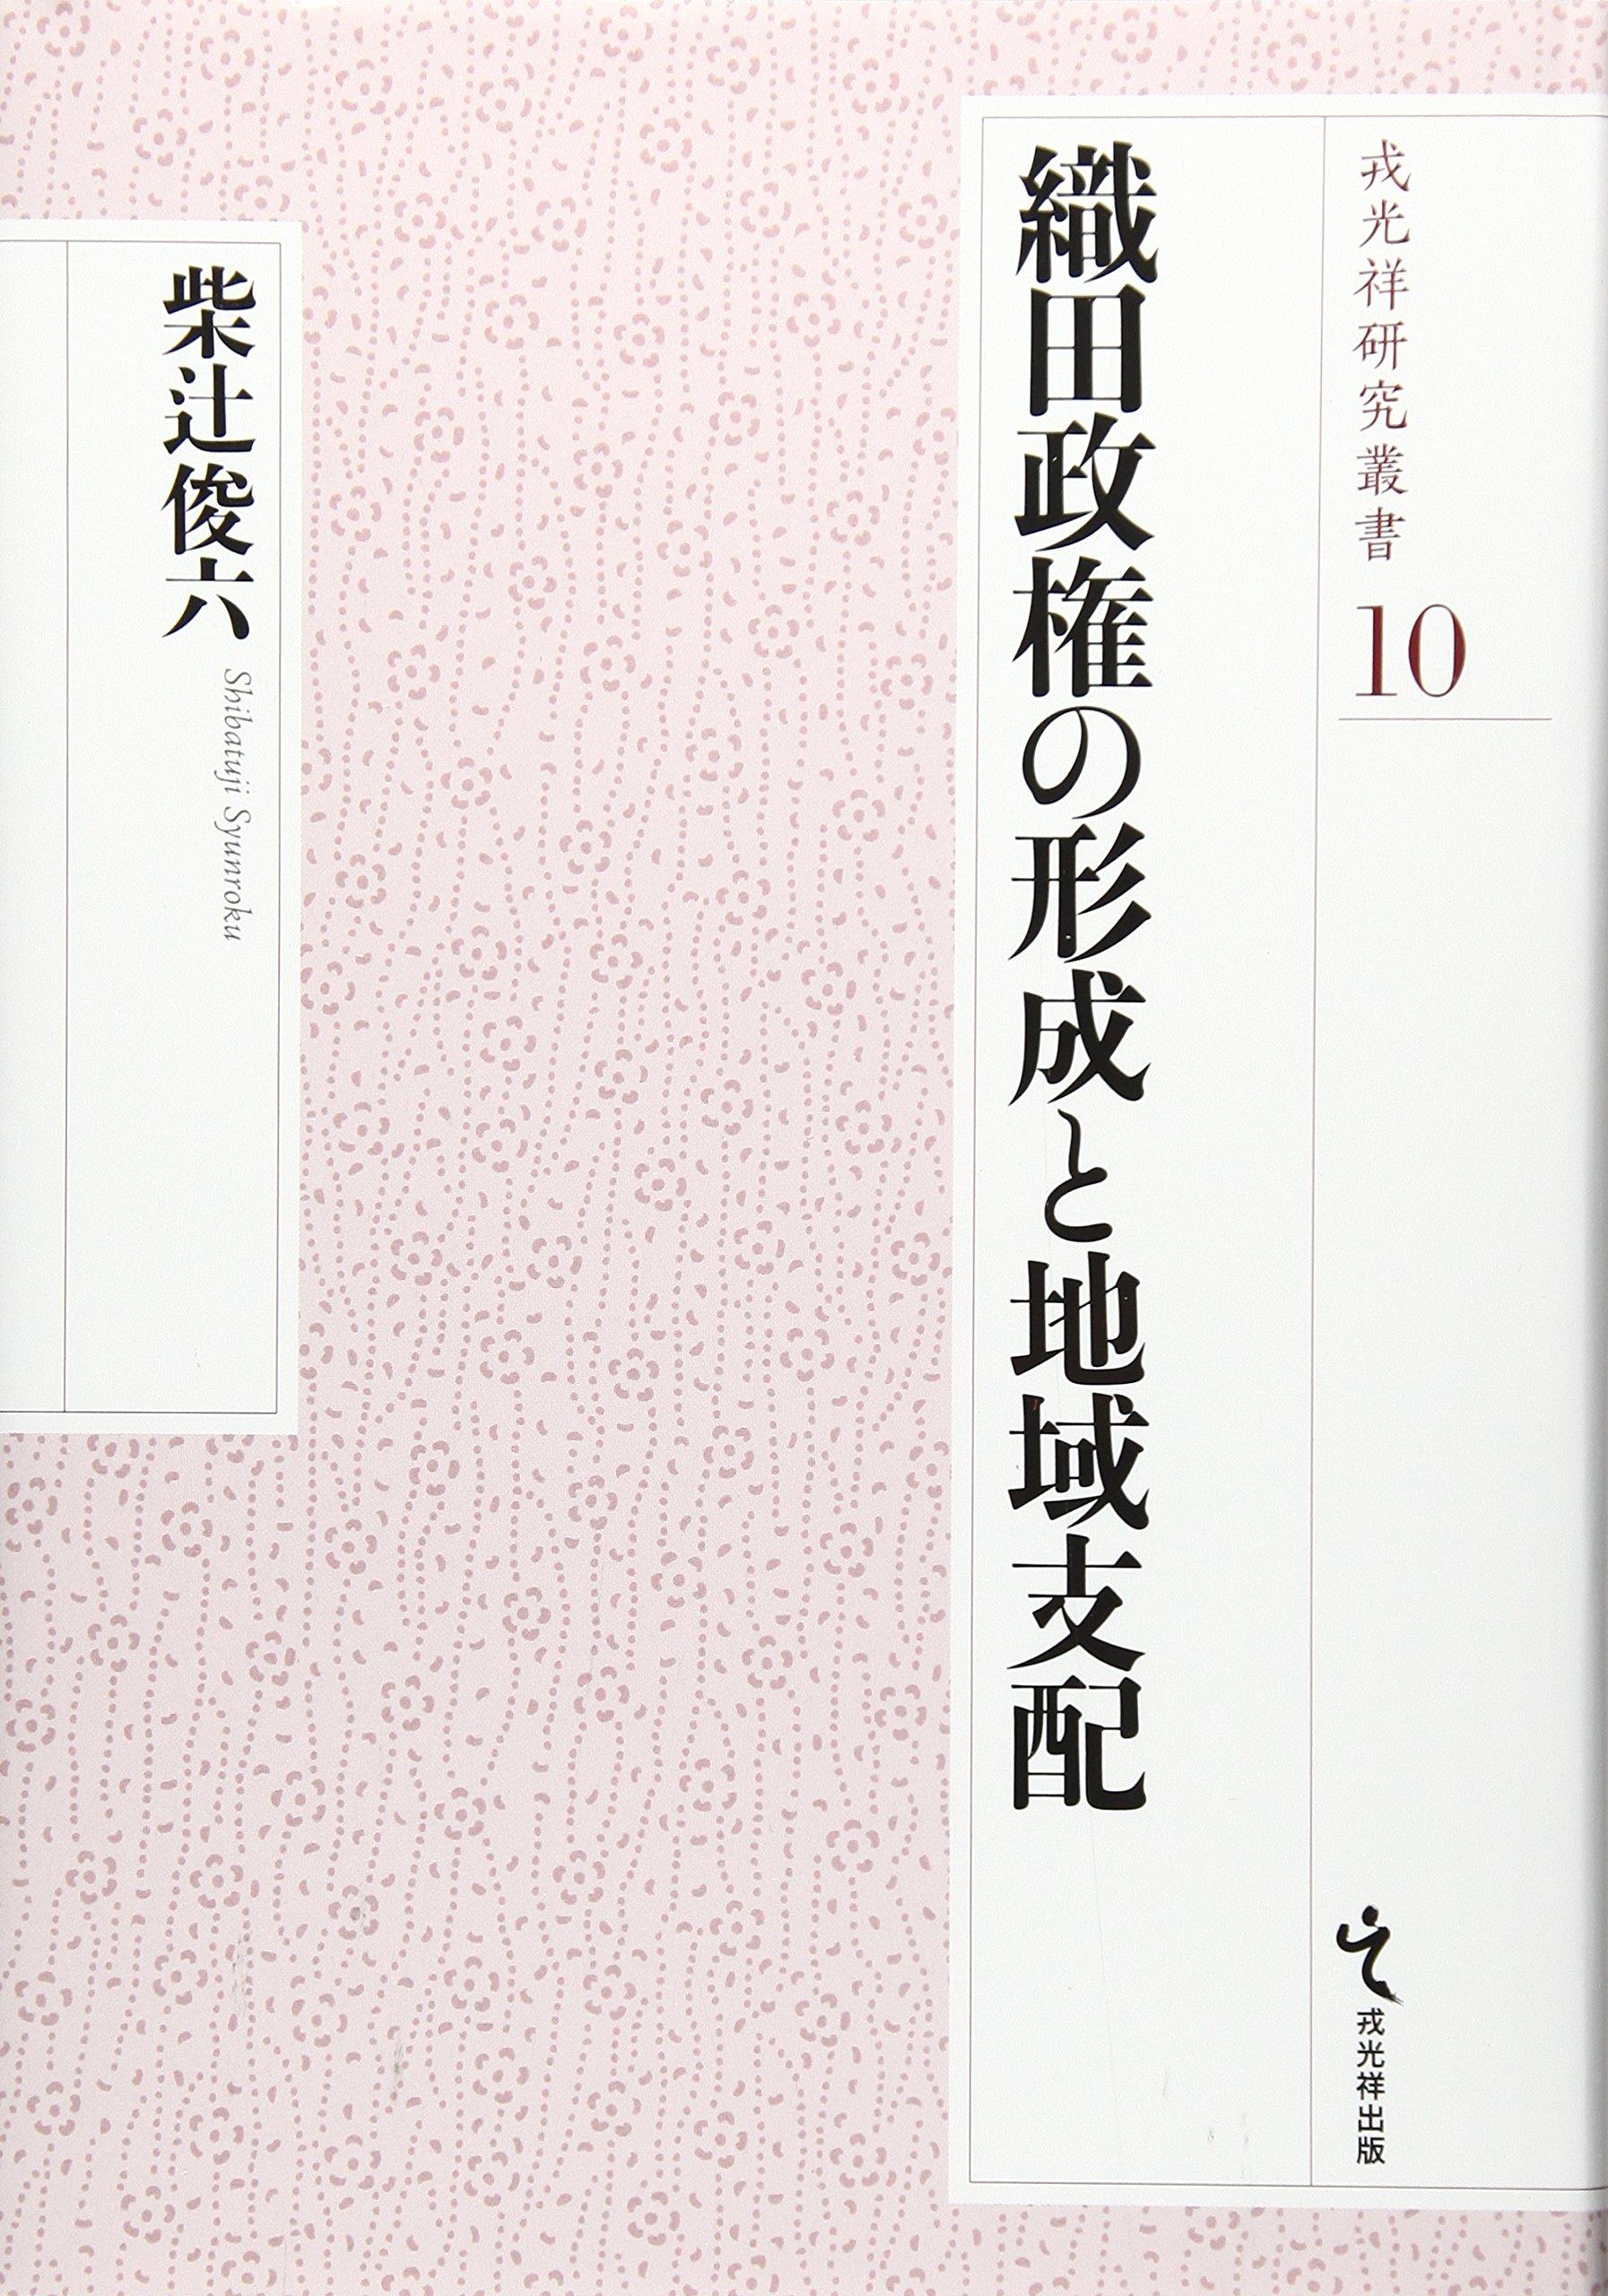 織田政権の形成と地域支配 (戎光...